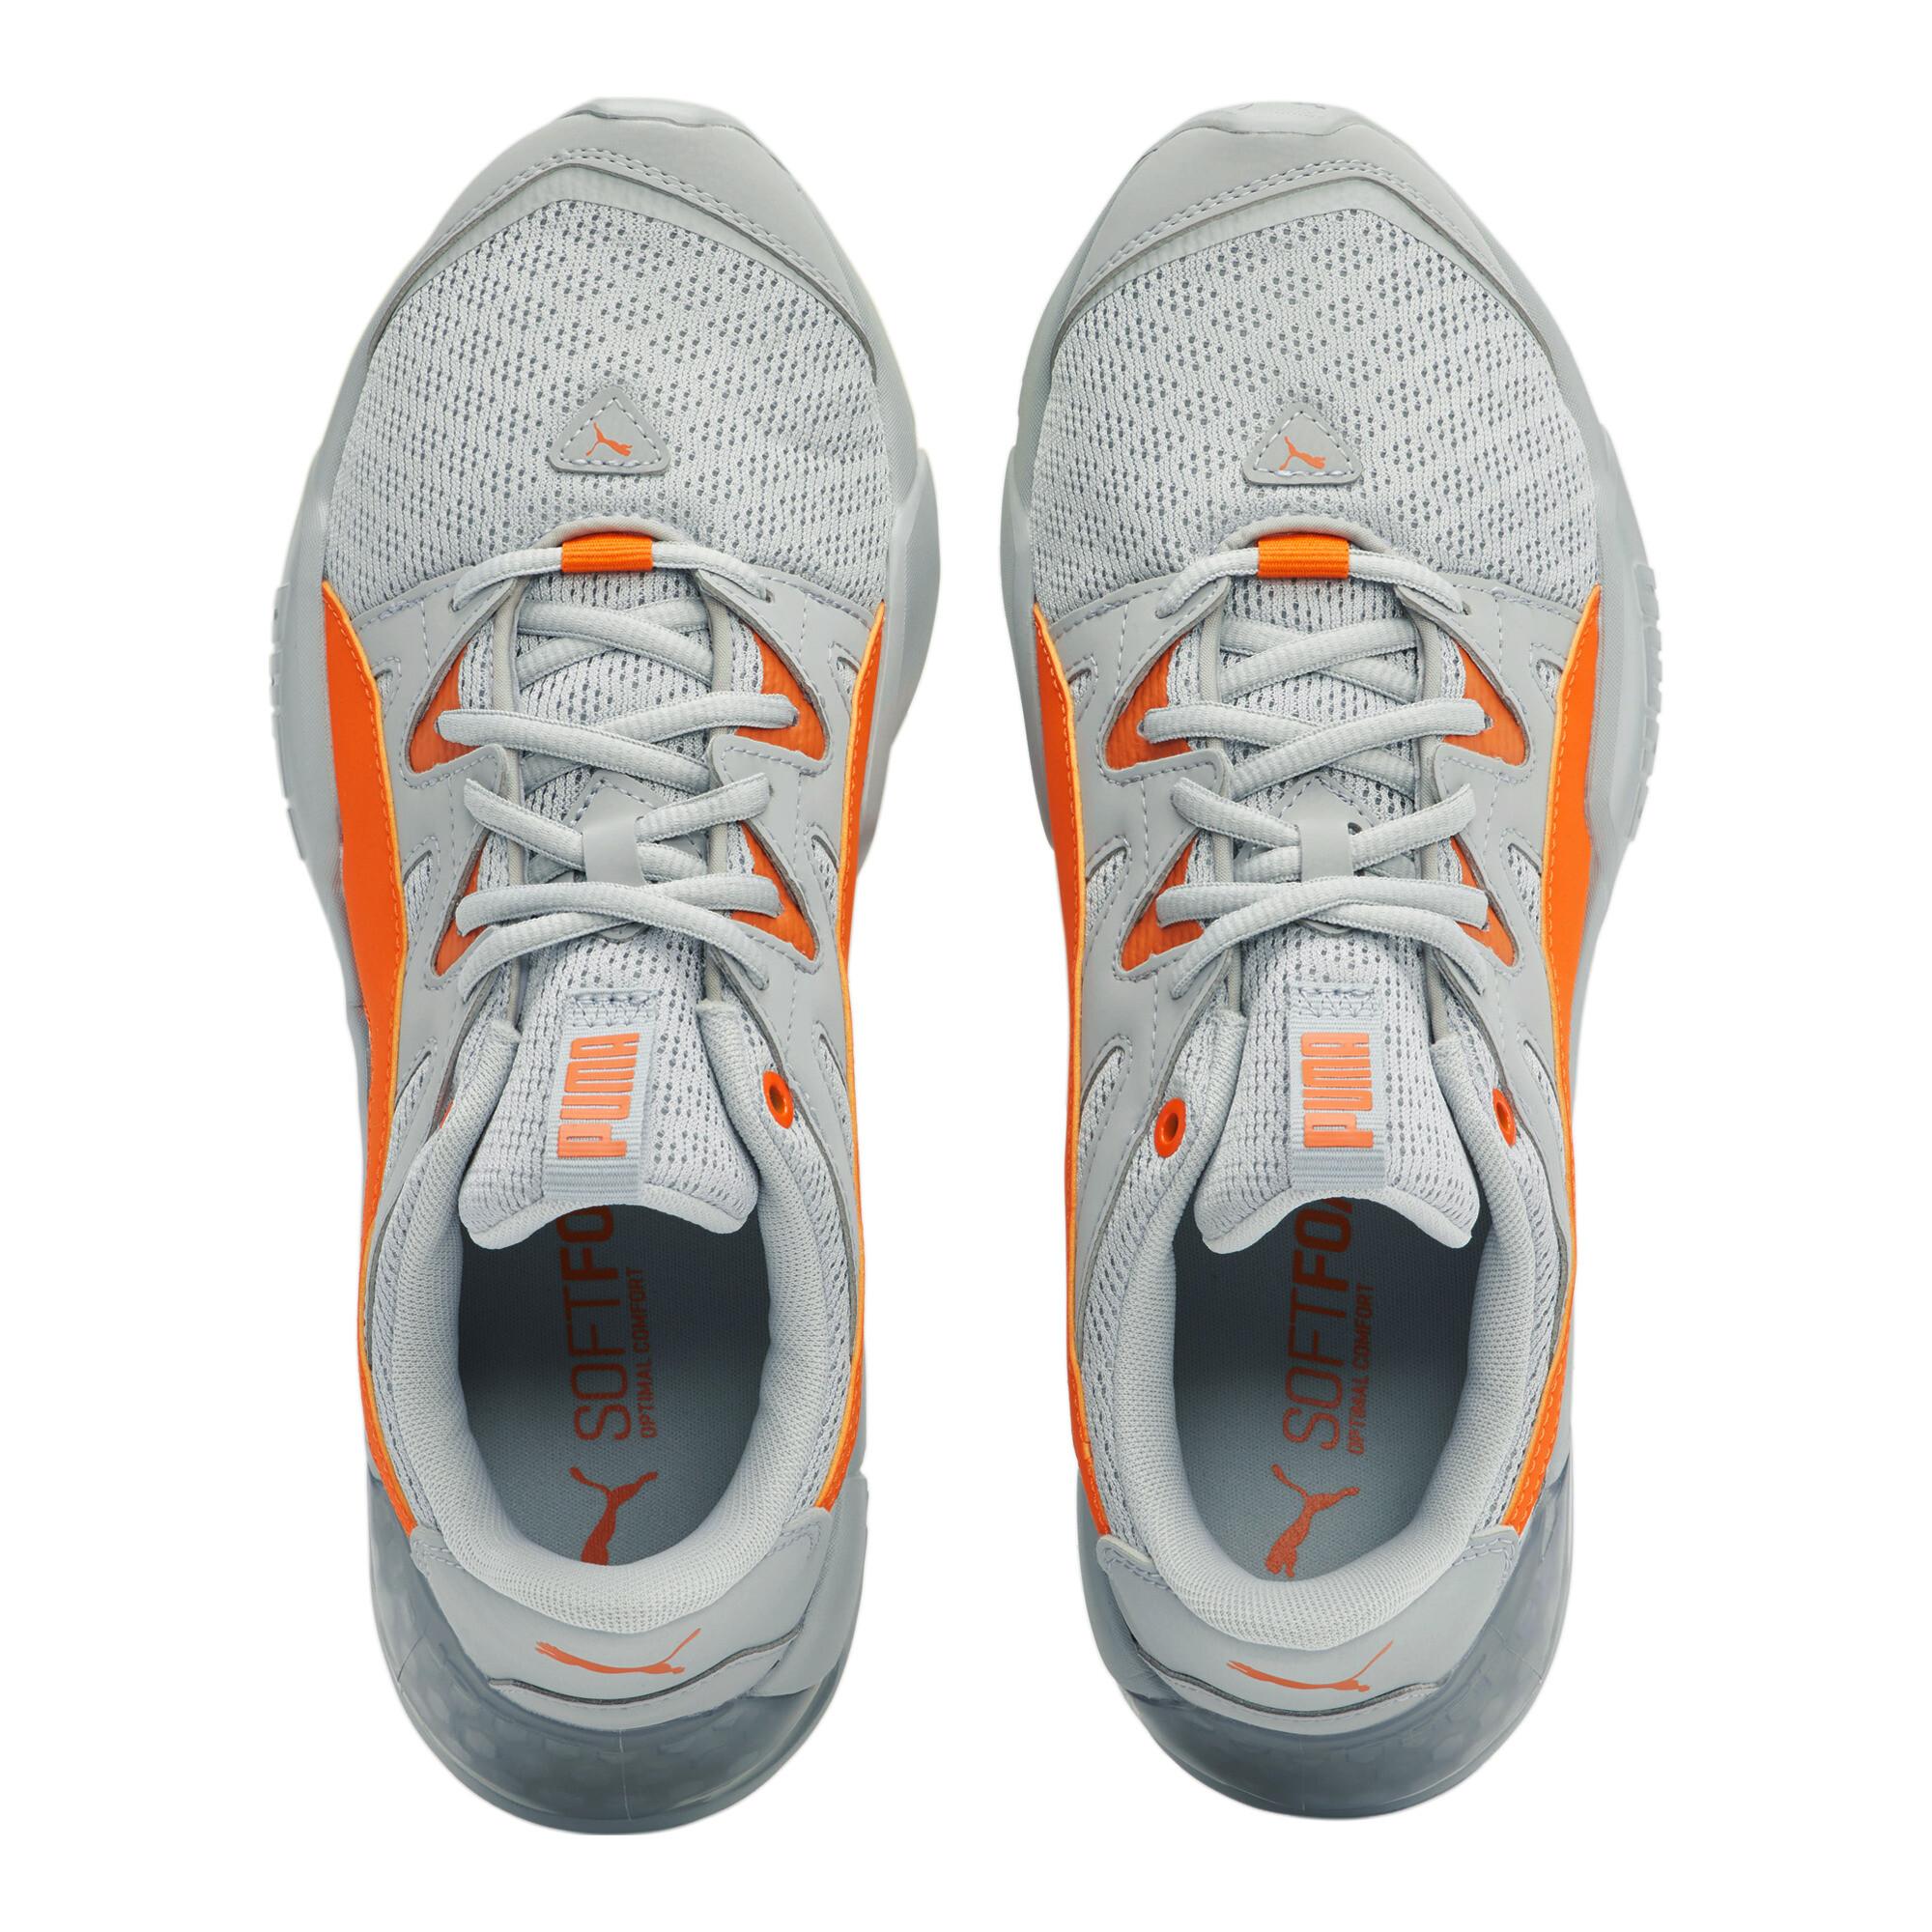 thumbnail 24 - PUMA Men's CELL Pharos Training Shoes